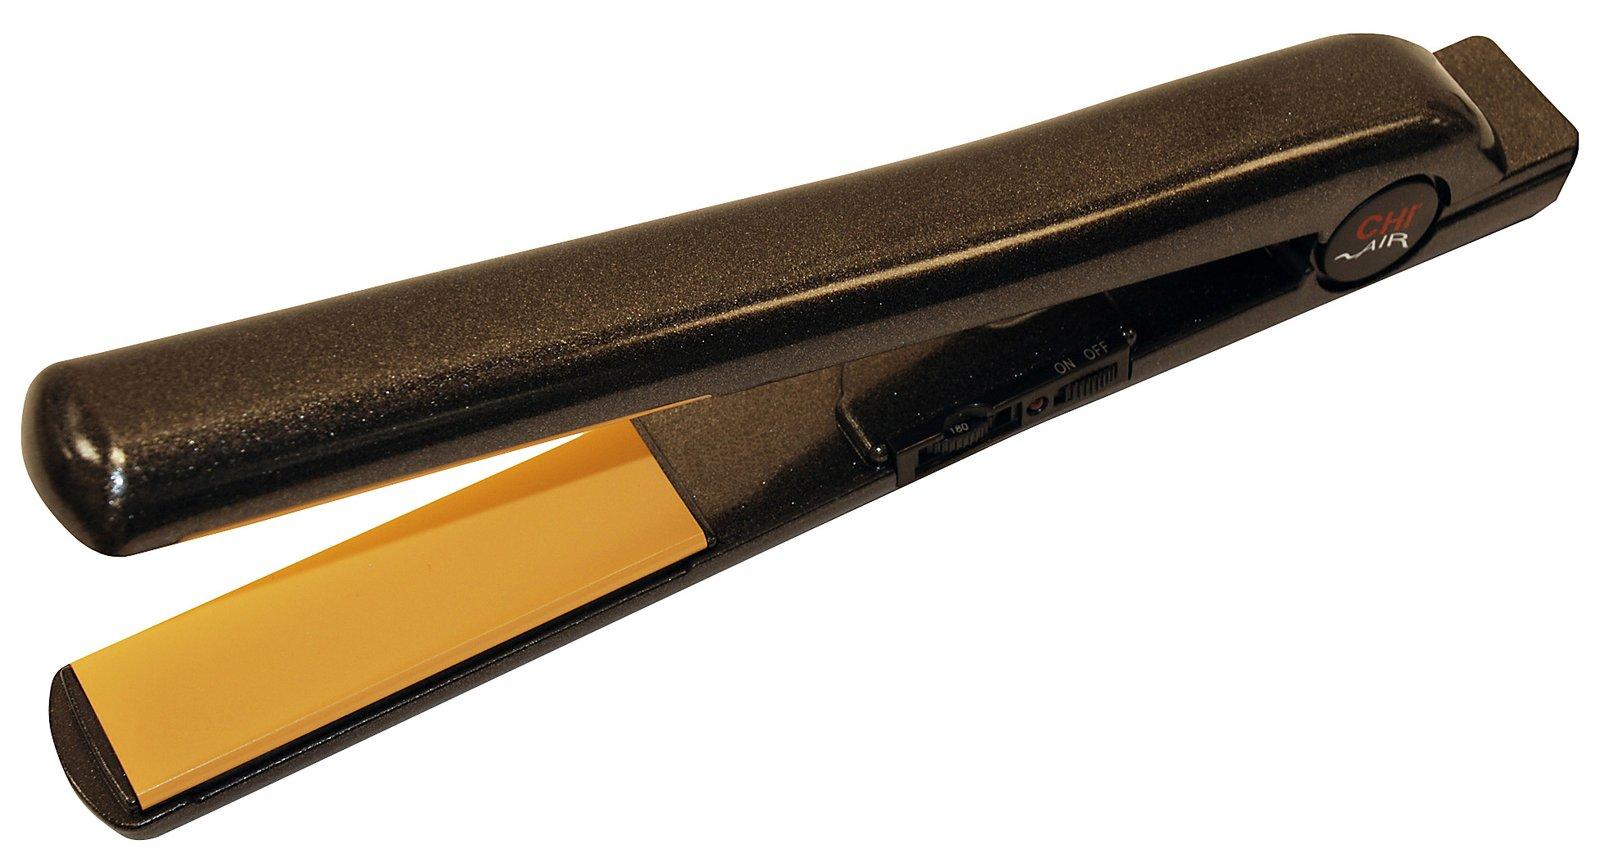 CHI Air Expert Classic Tourmaline Flat Iron Onyx Black